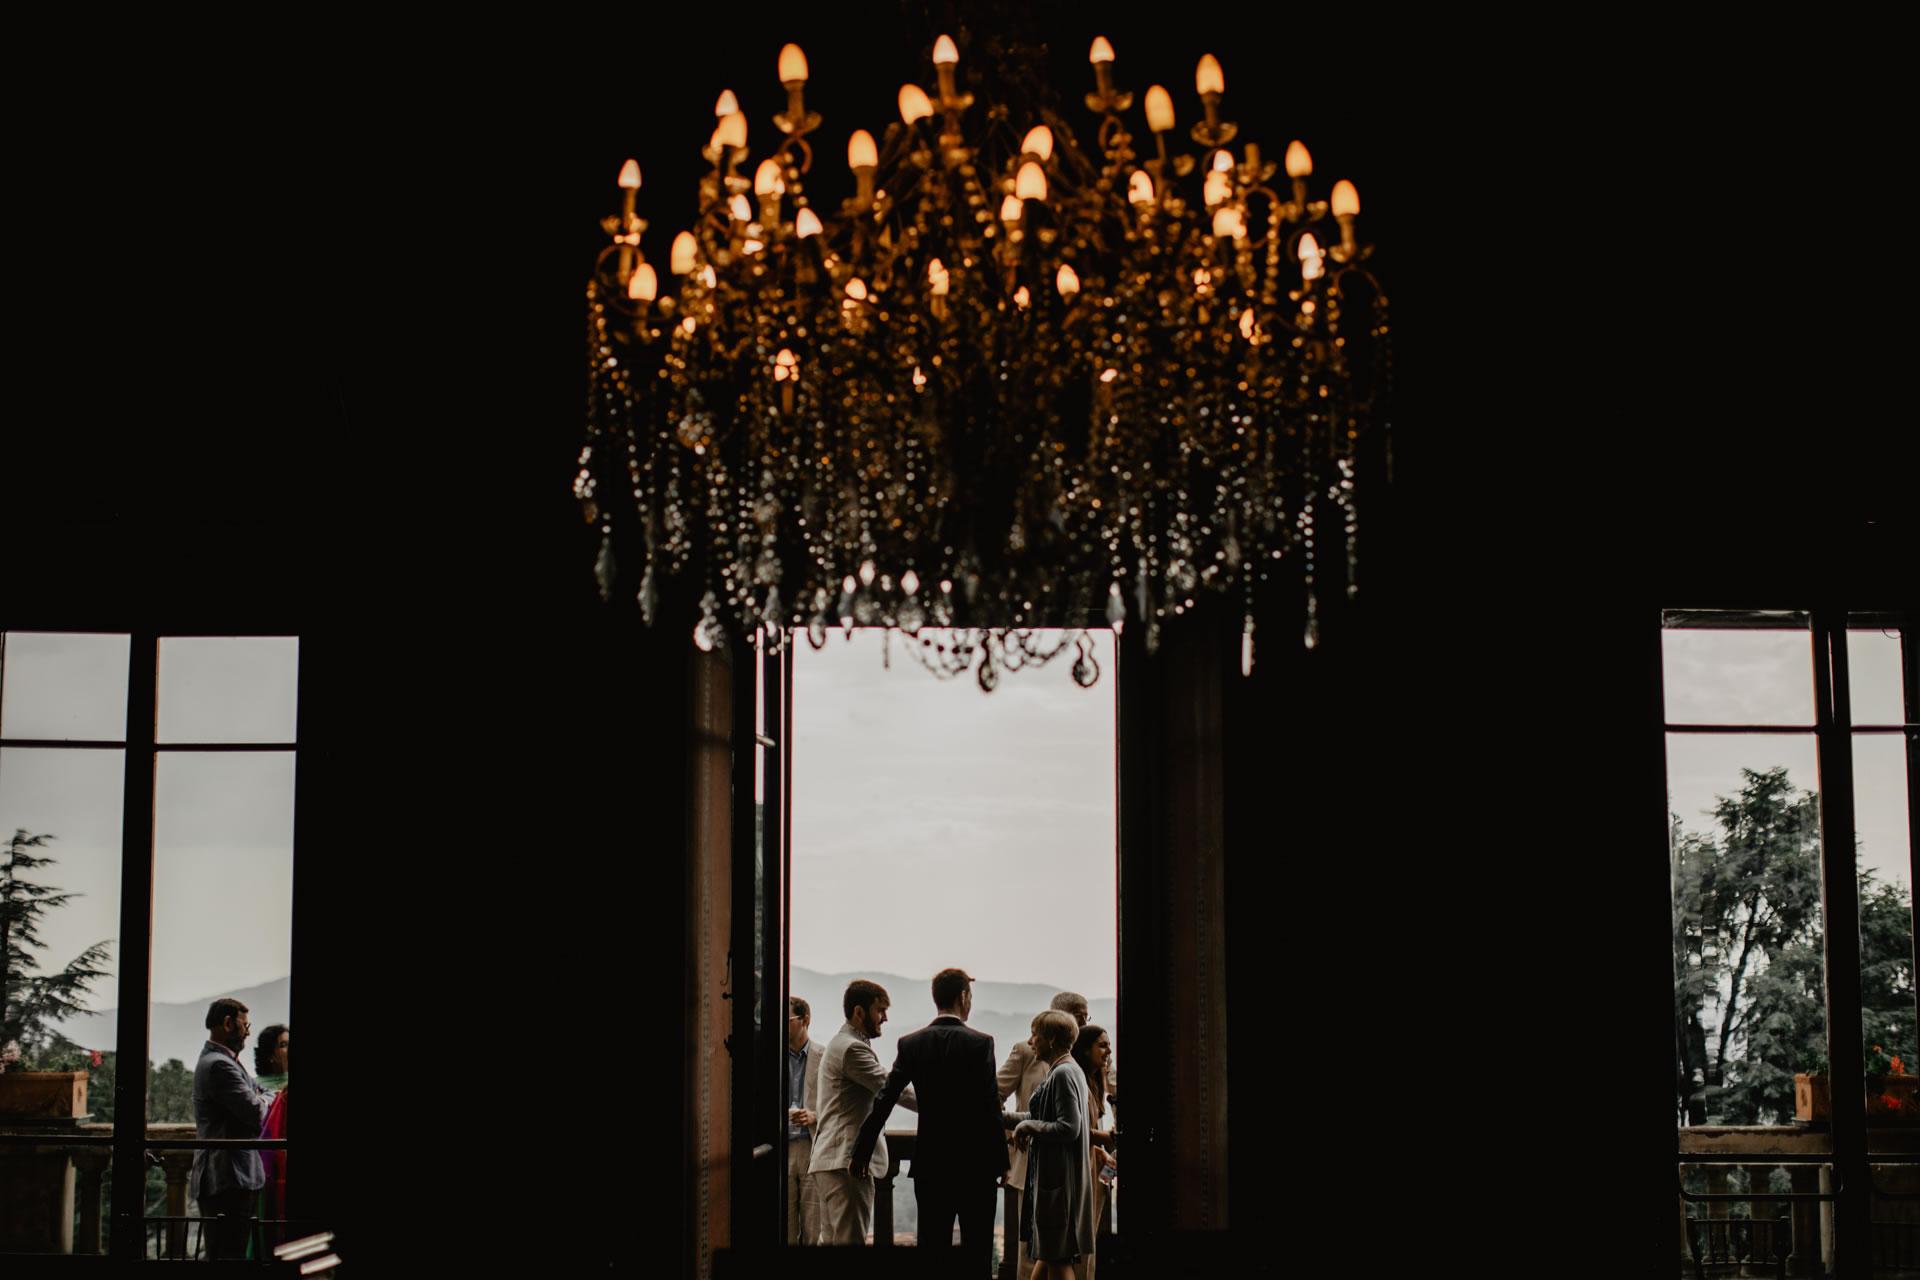 - 62 :: Indian wedding ceremony at Villa Pitiana :: Luxury wedding photography - 61 ::  - 62